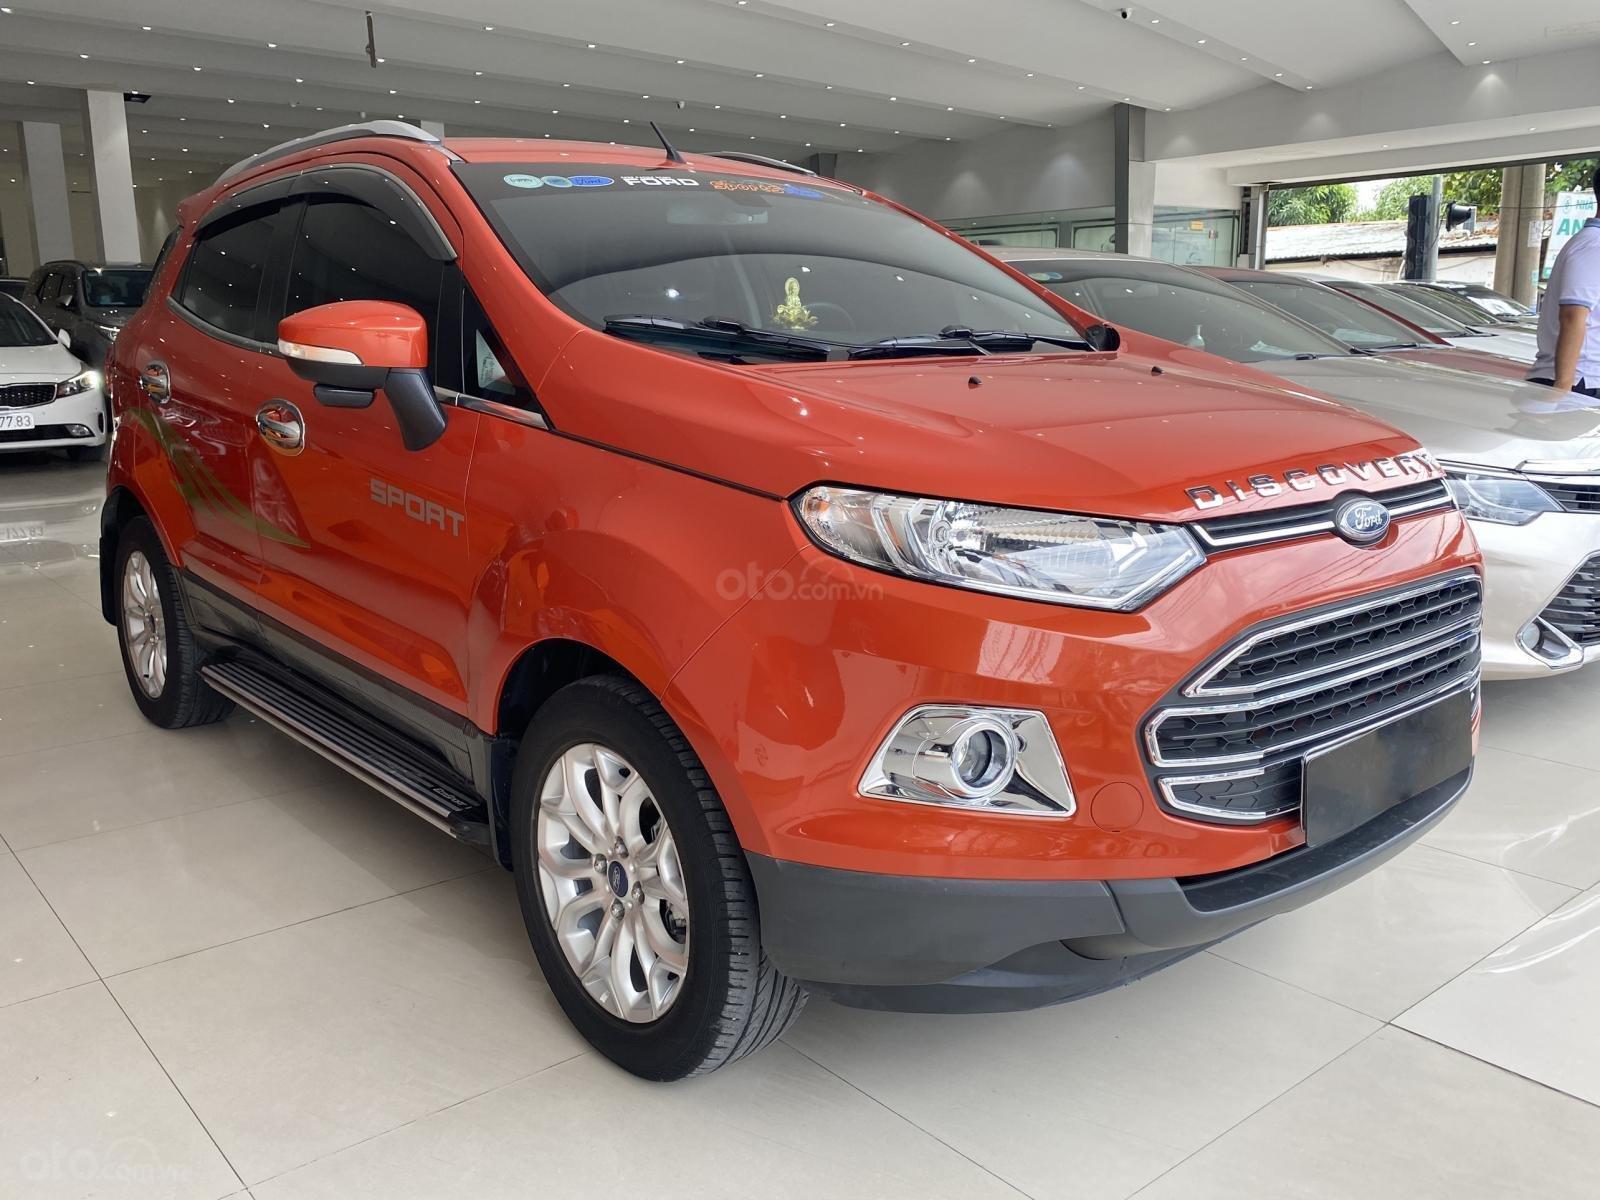 Cần bán Ford Ecosport 1.5 Titanium mẫu mới 2018 (2)